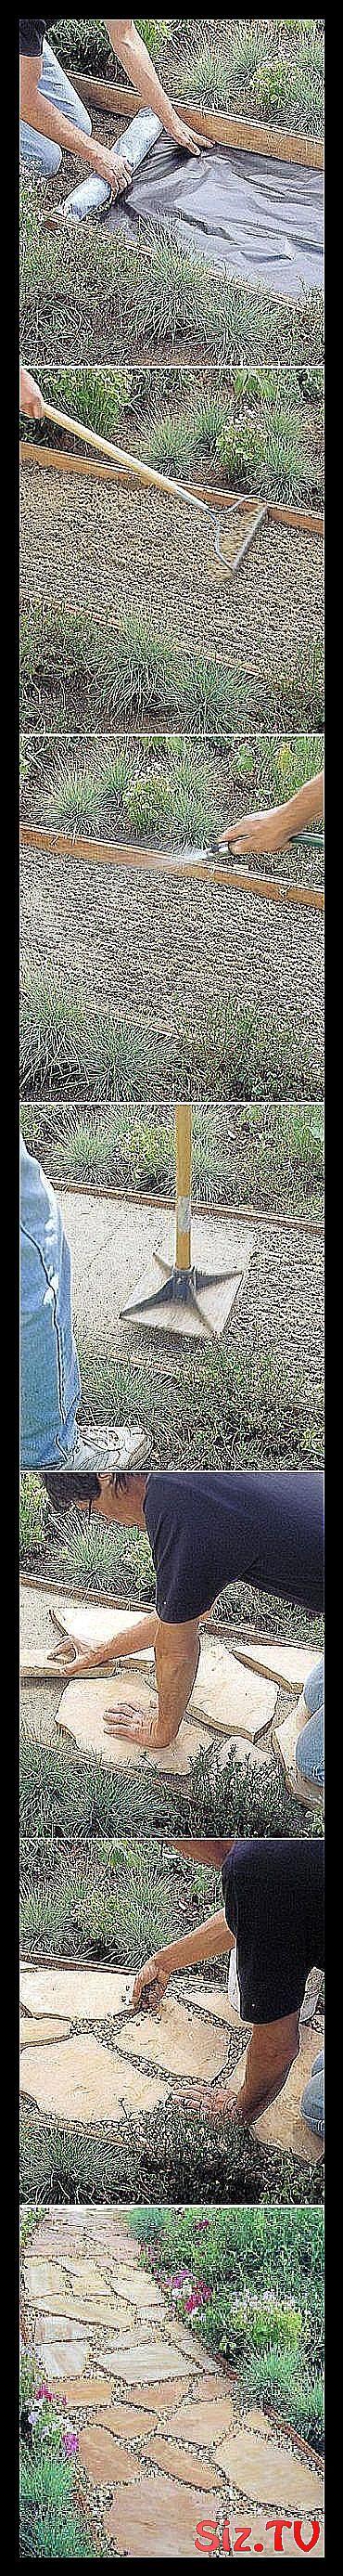 Photo of Patio Paving Flagstone Path 26  Best Ideas Patio Paving Flagstone Path 26  Best …